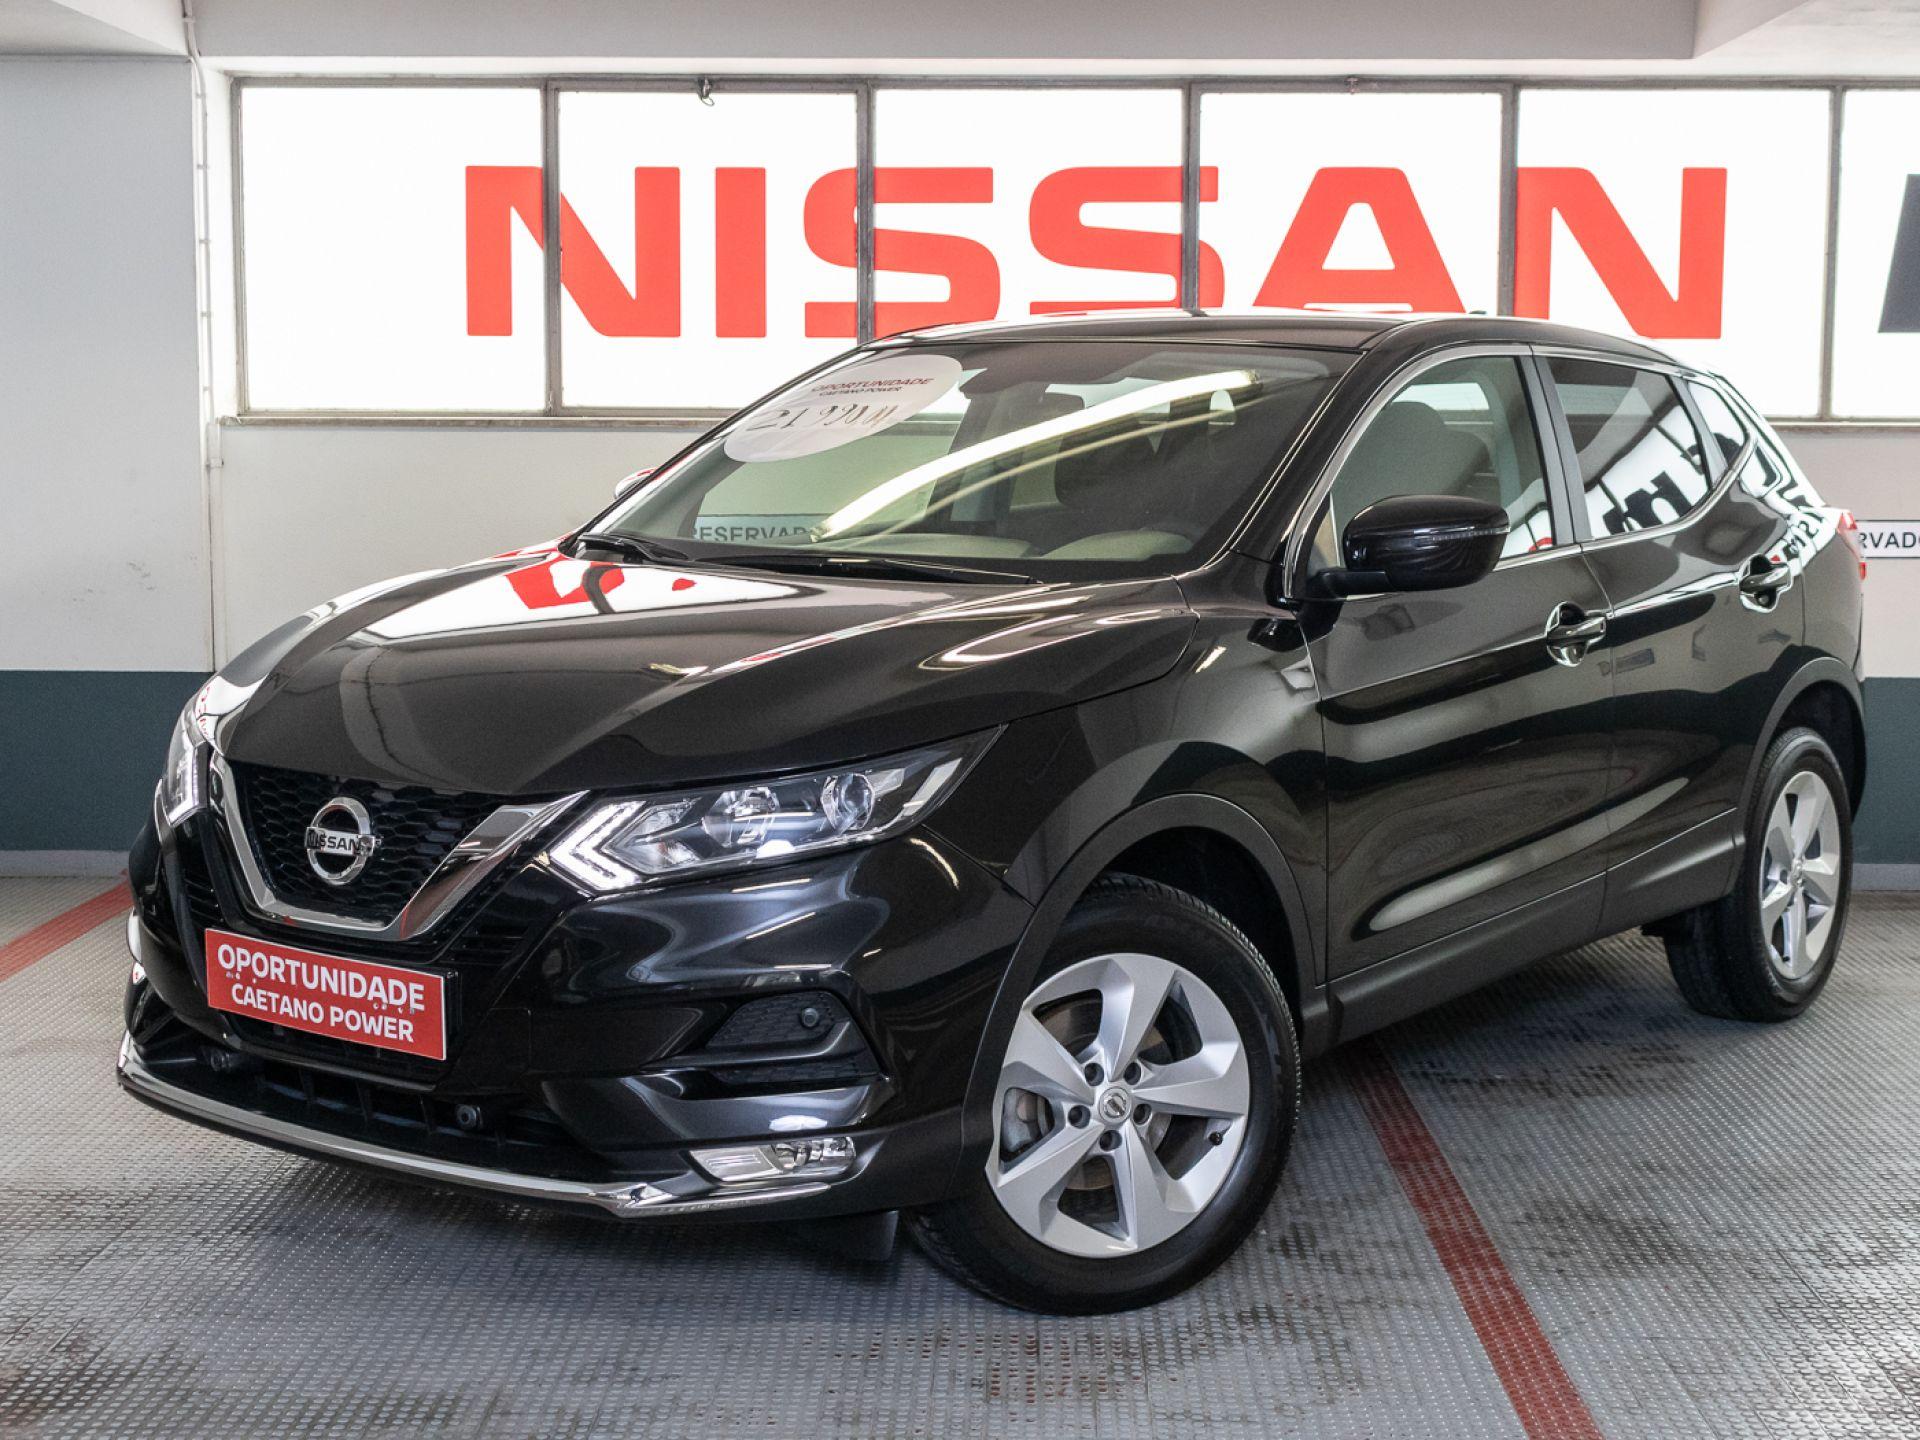 Nissan Qashqai 1.2 DIG-T 115cv Acenta usada Lisboa